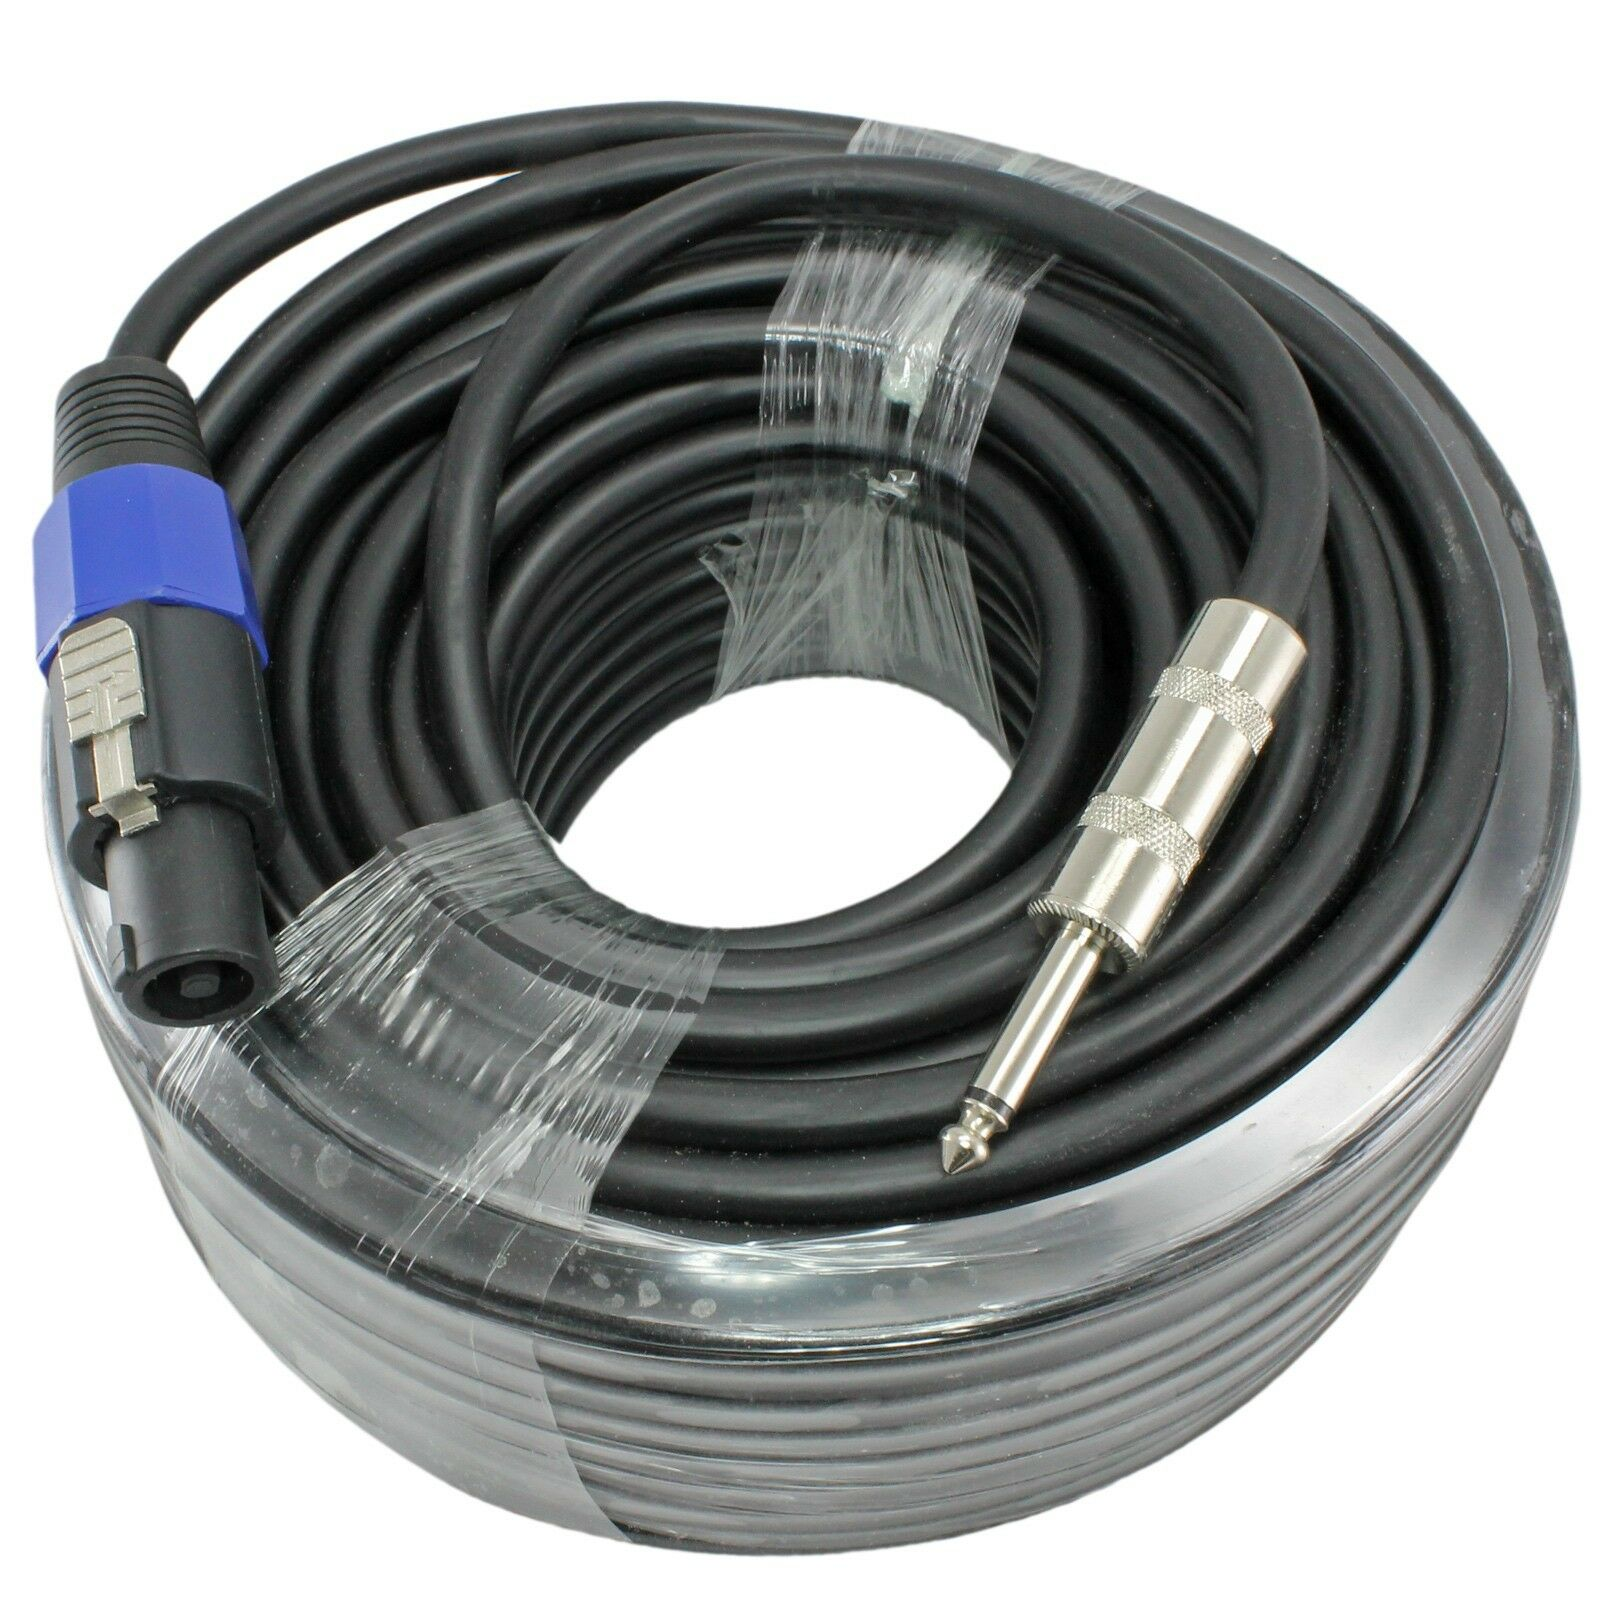 100 Foot 12 Gauge 1/4 to Speakon Compatible Speaker Cable for PA DJ ...